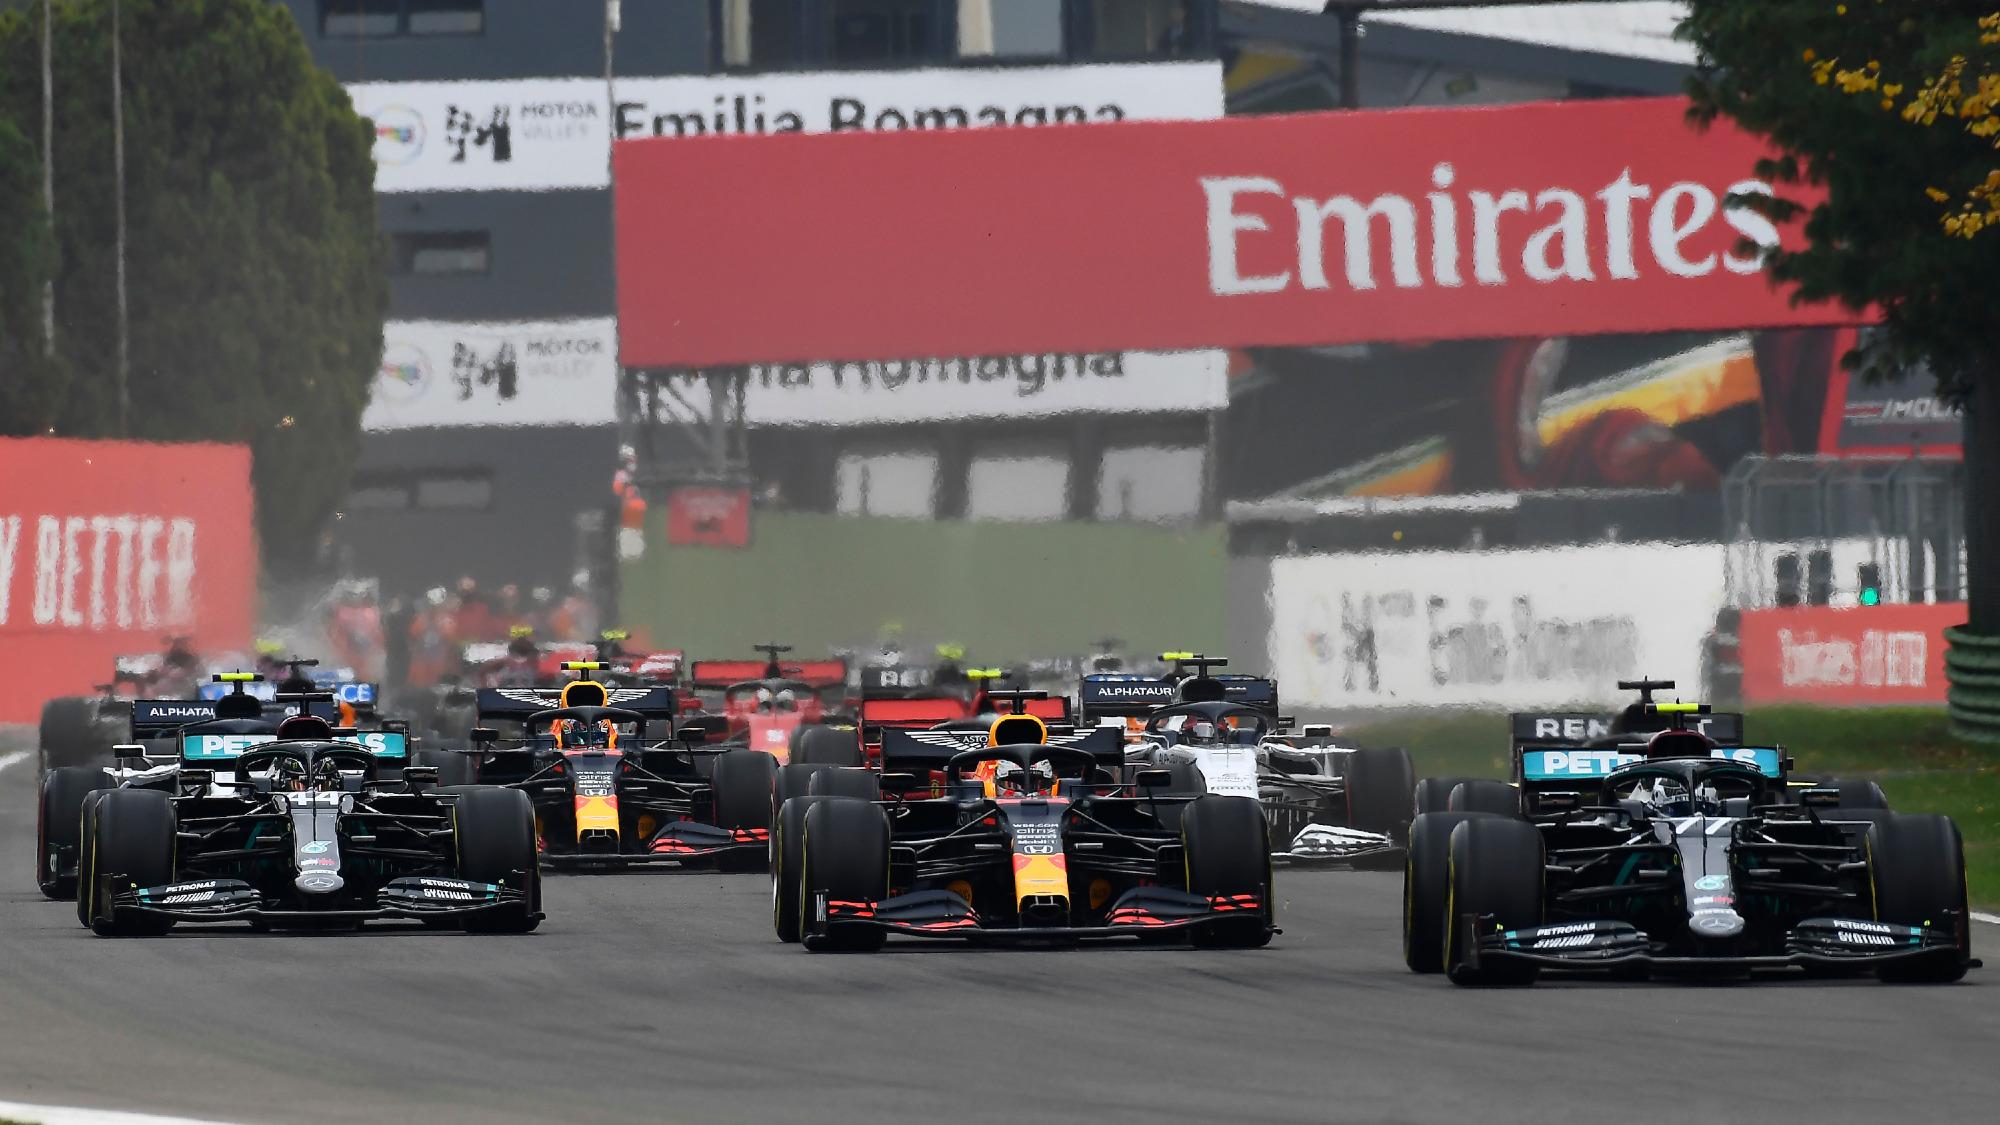 2020 Emilia Romagna GP, Race start